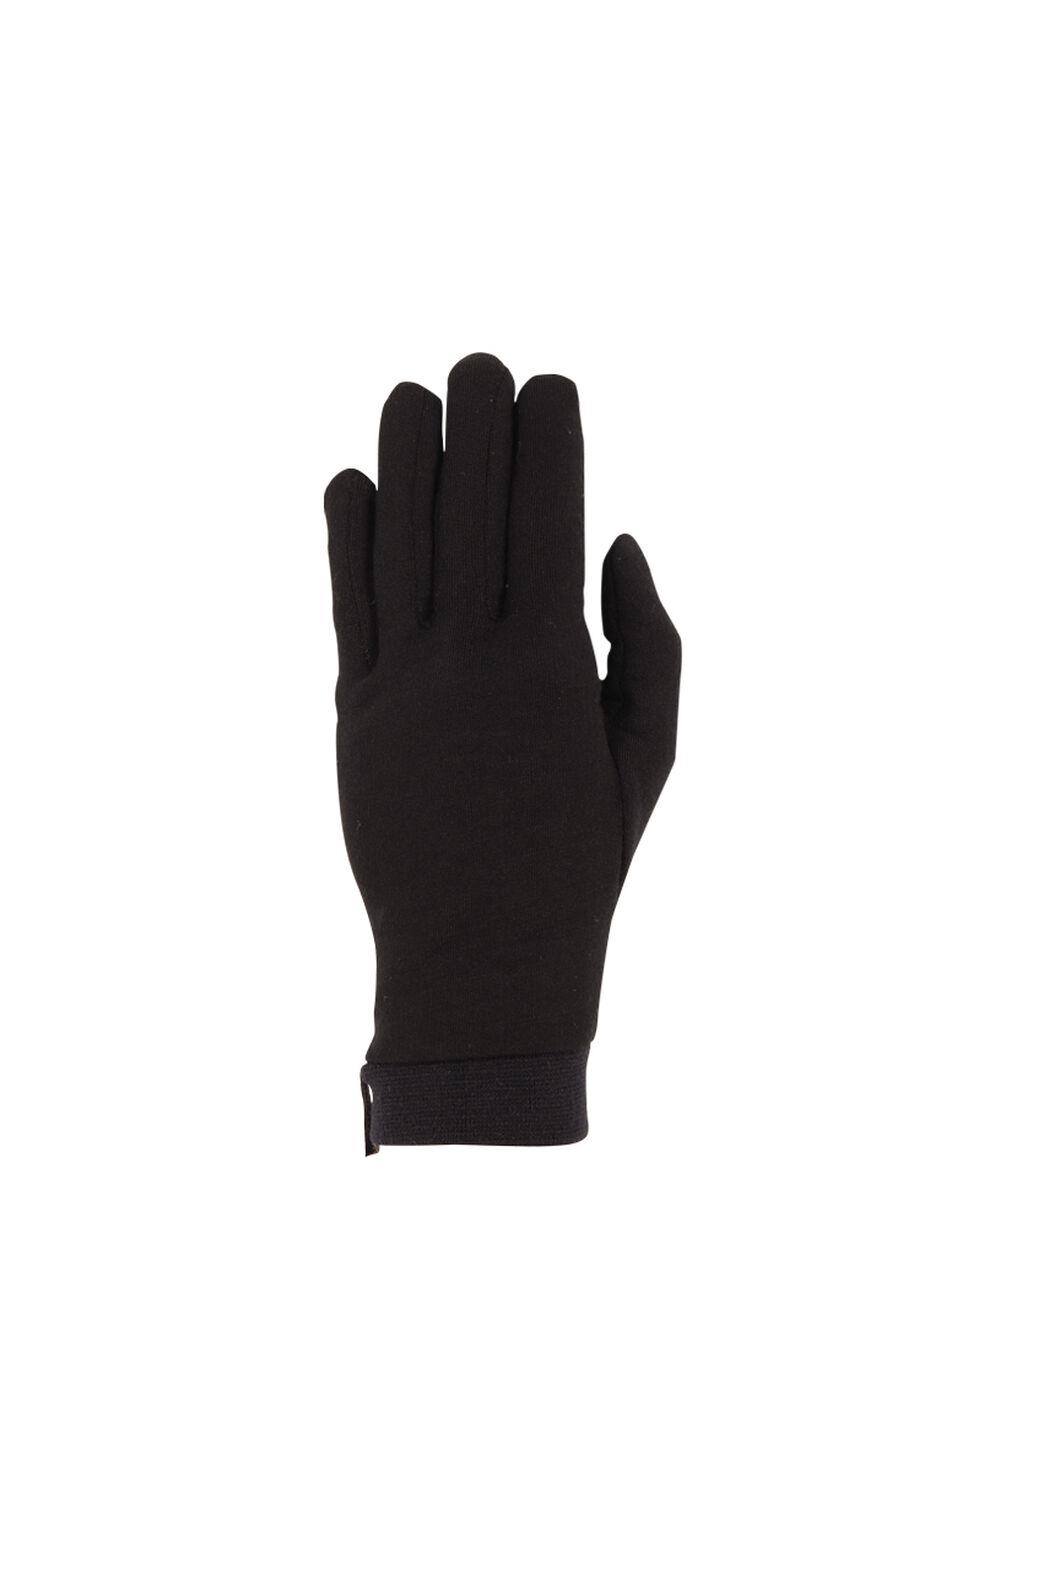 Macpac Merino Liner Gloves, Black, hi-res